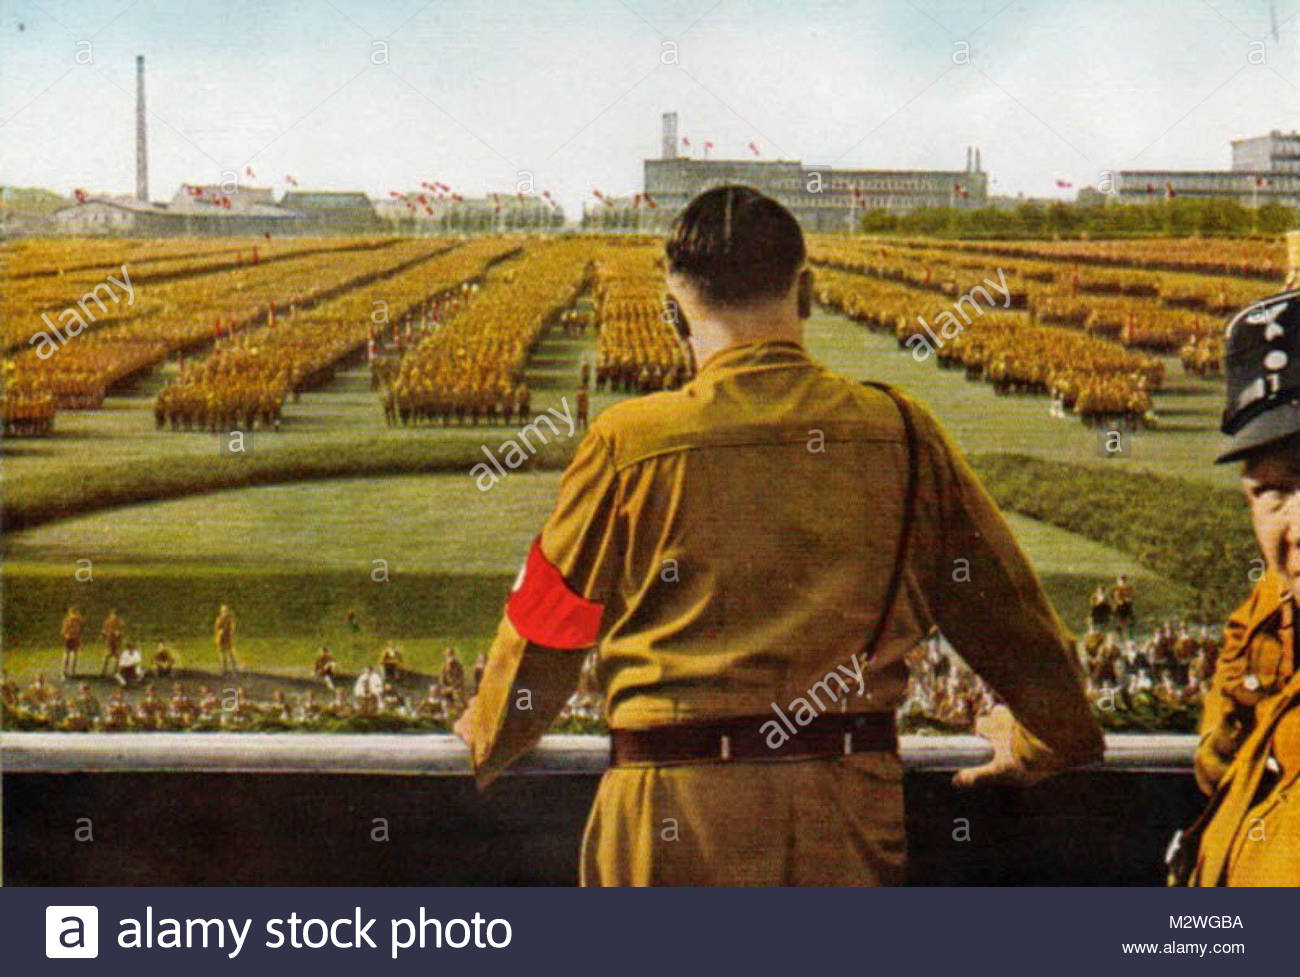 Adolf Hitler At a Nazi rally - Stock Image